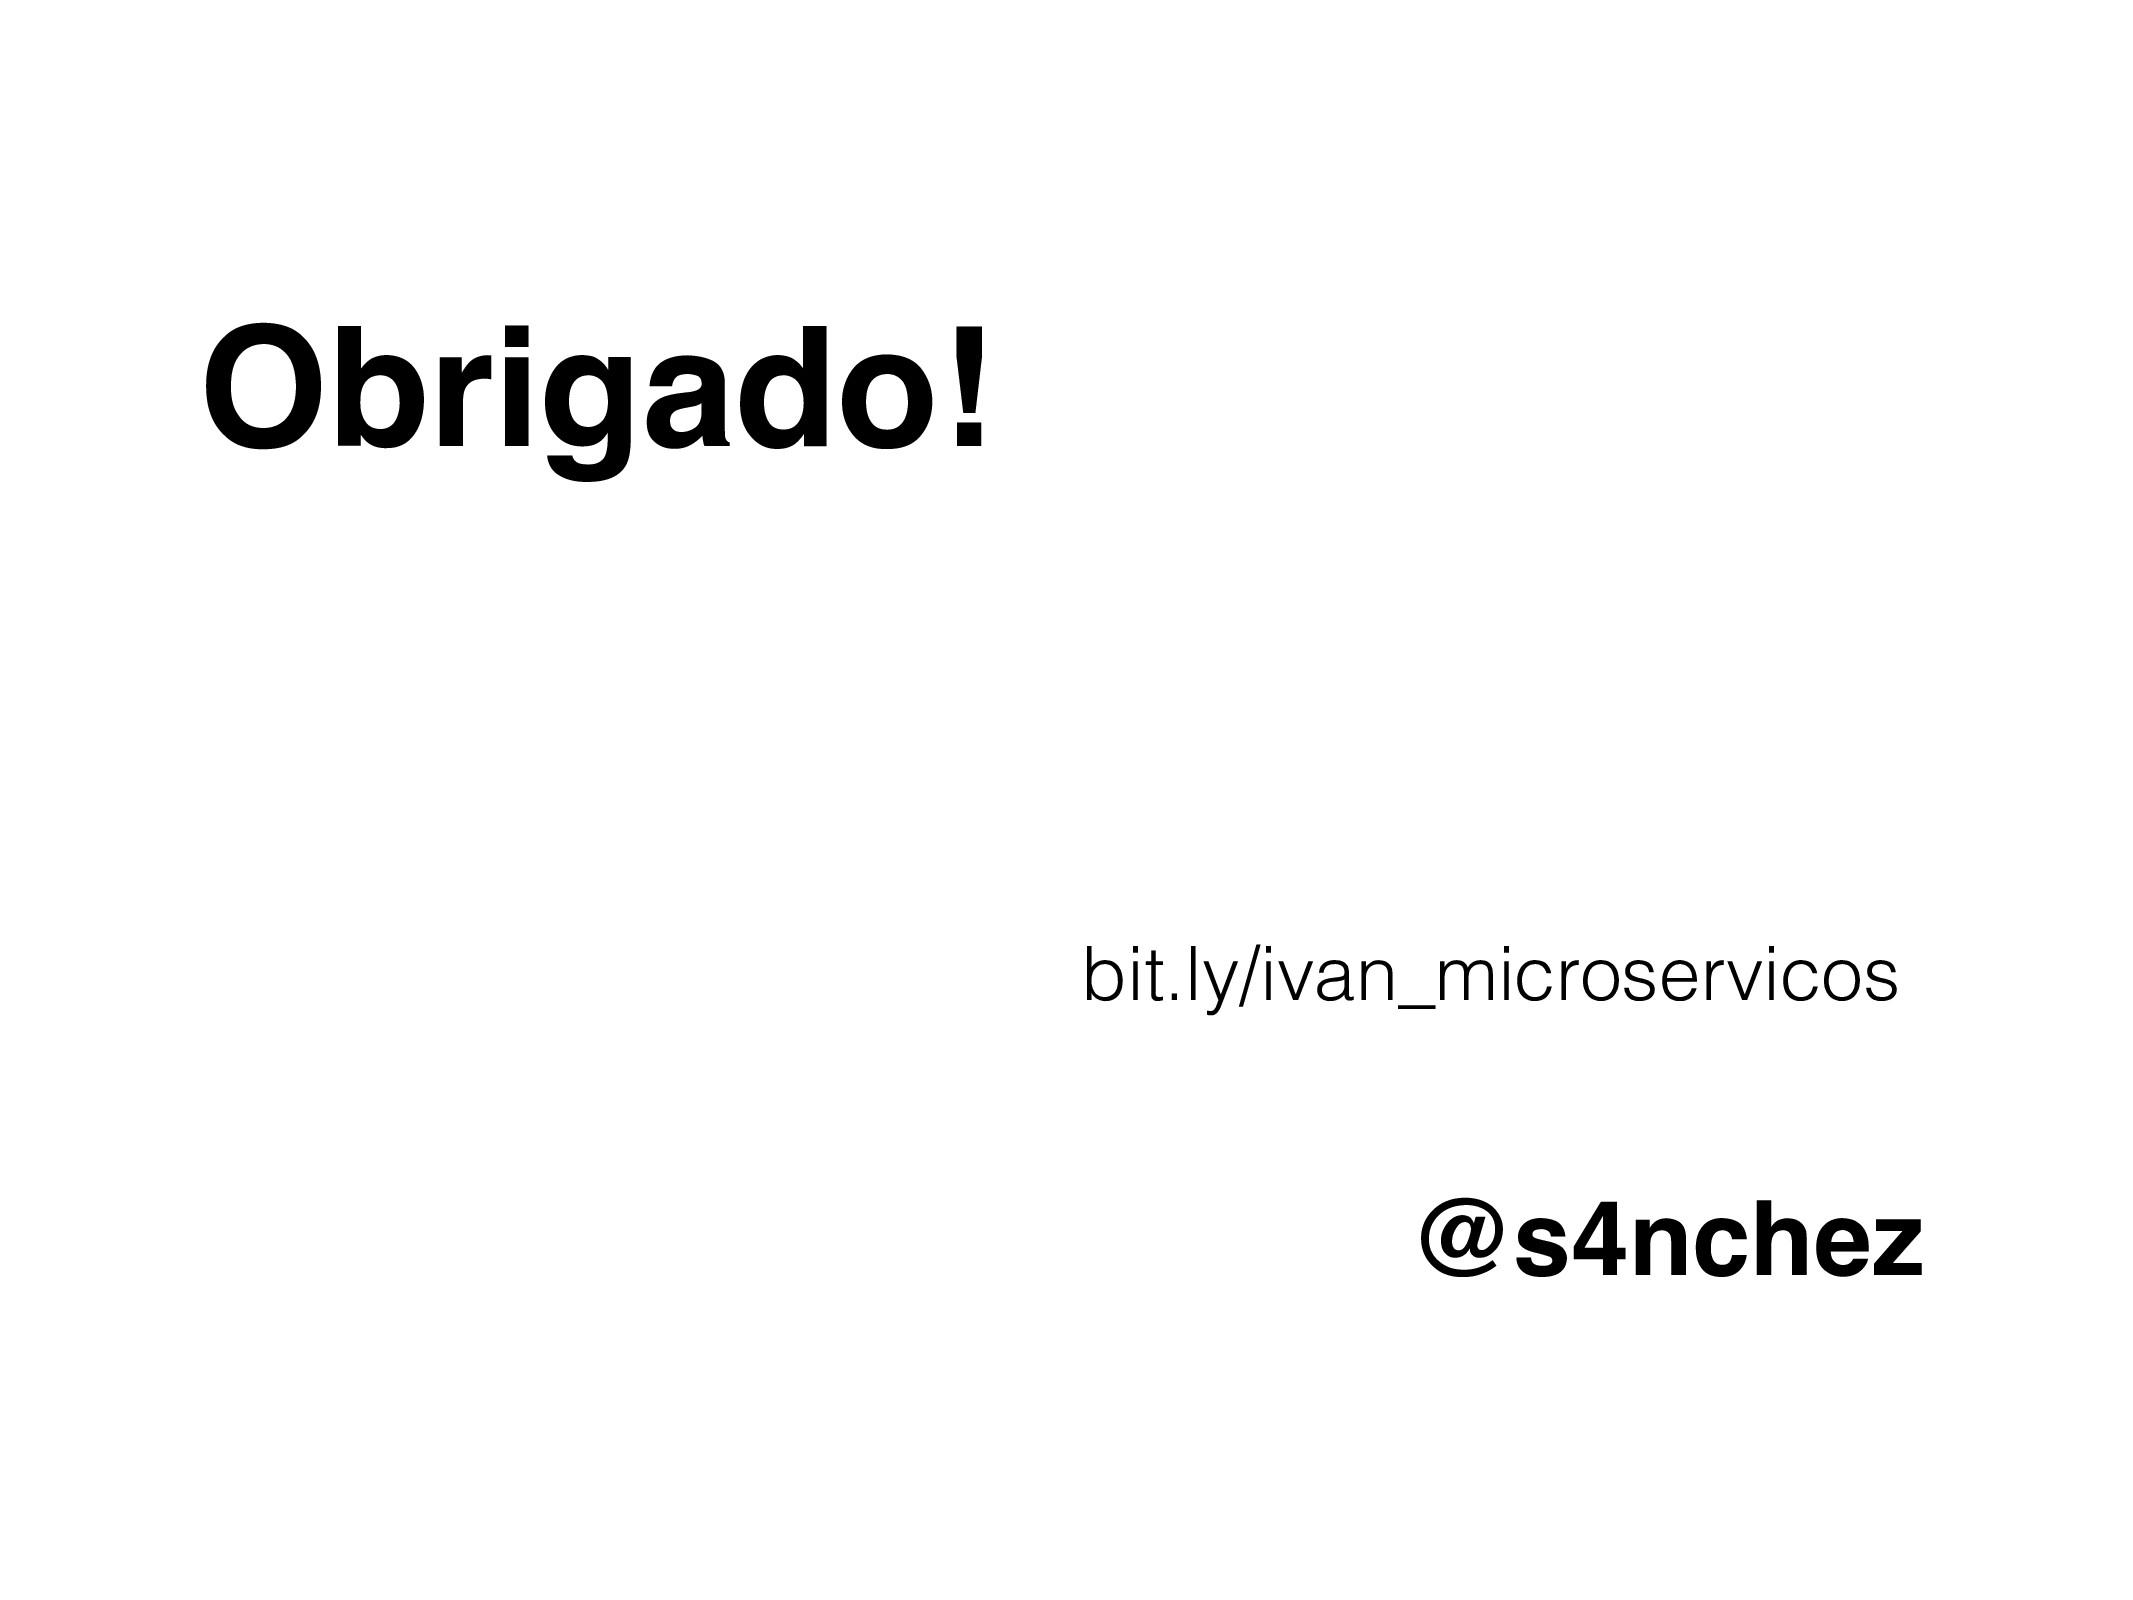 Obrigado! @s4nchez bit.ly/ivan_microservicos